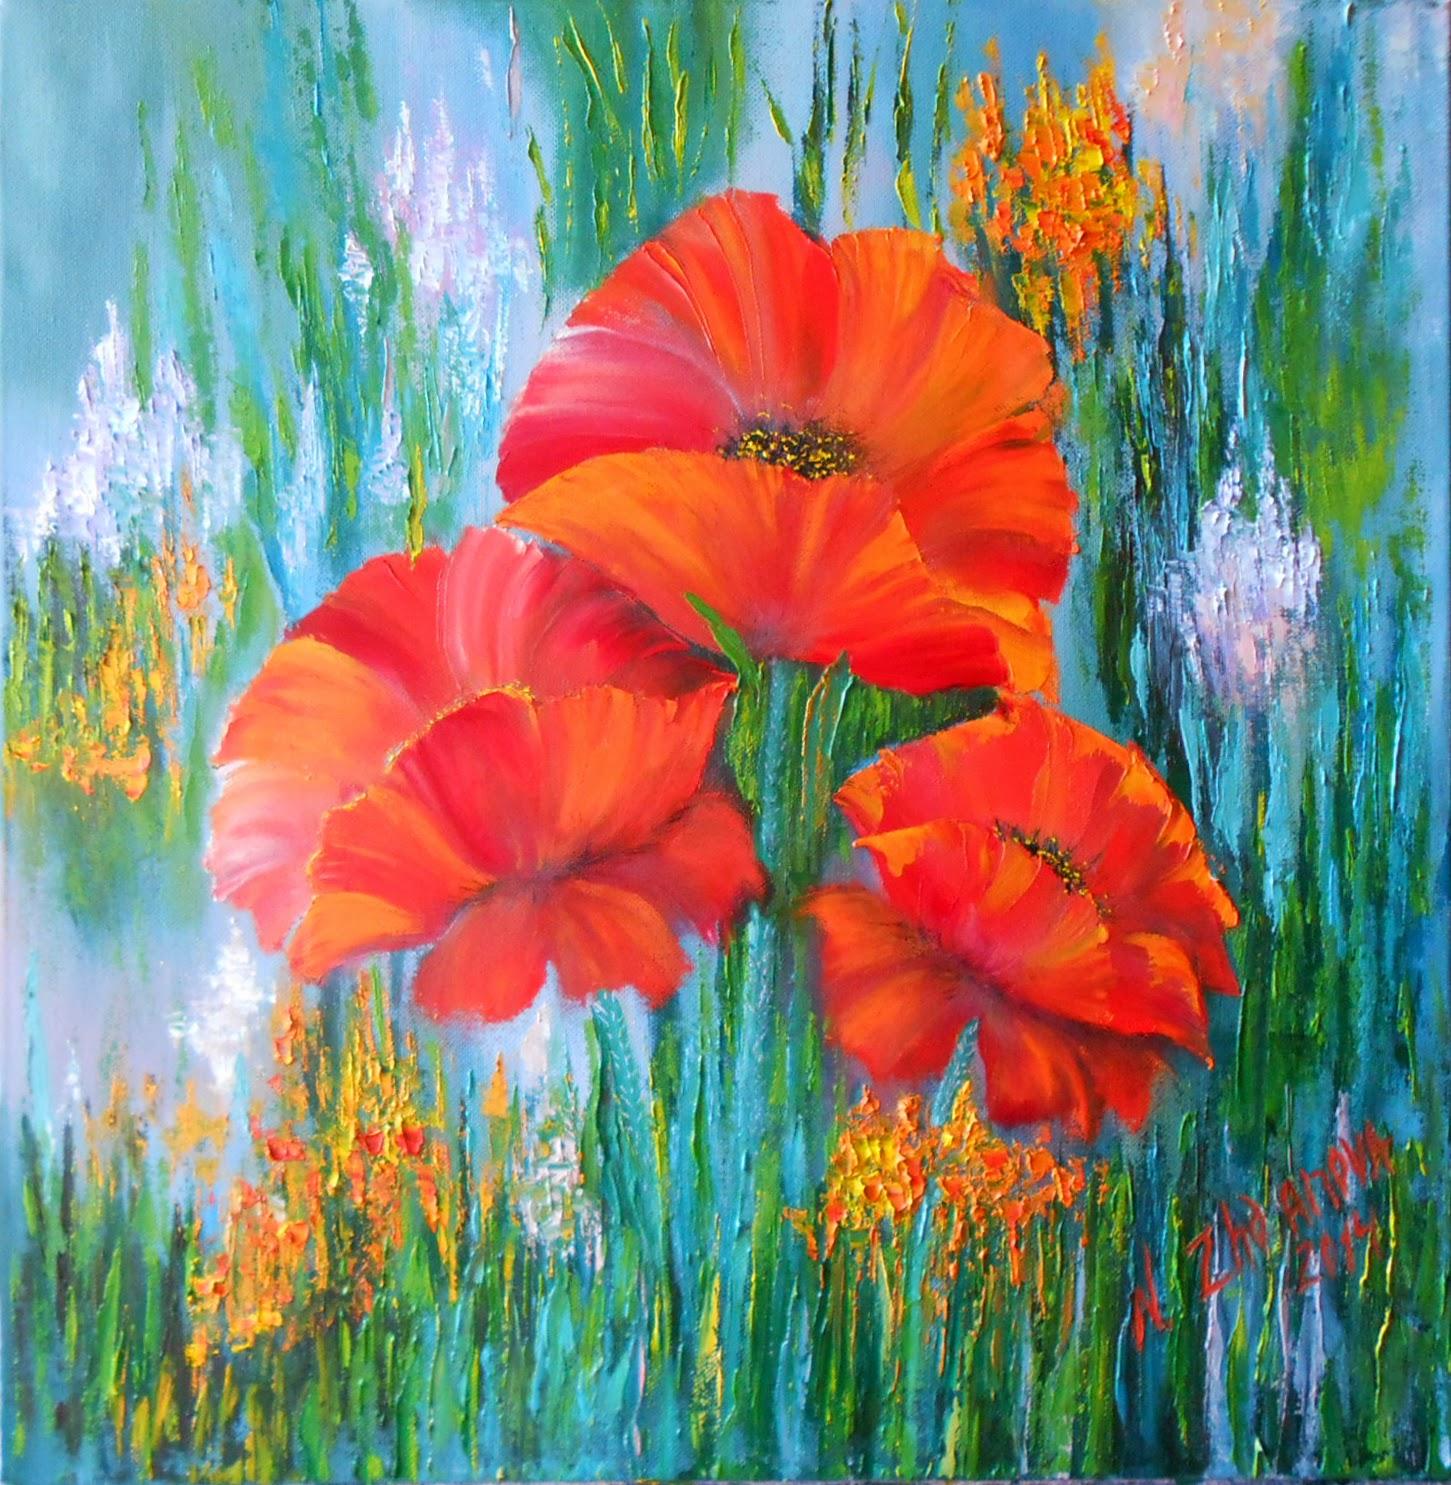 Original Paintings for Interior, Exclusive Digital Print ...